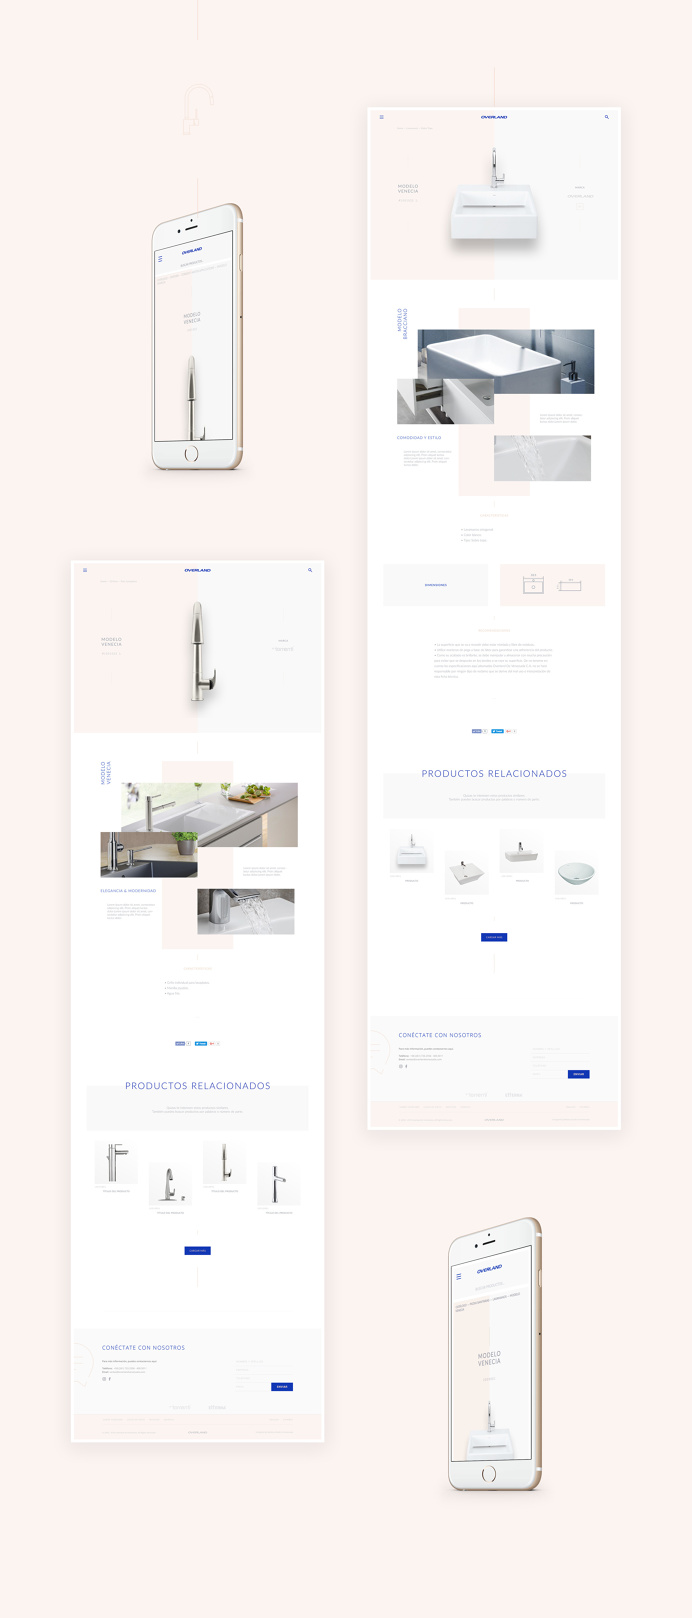 Overland #home #decoration #rose #style #design #interior #construction #space #details #elegant #environments #living #refinement